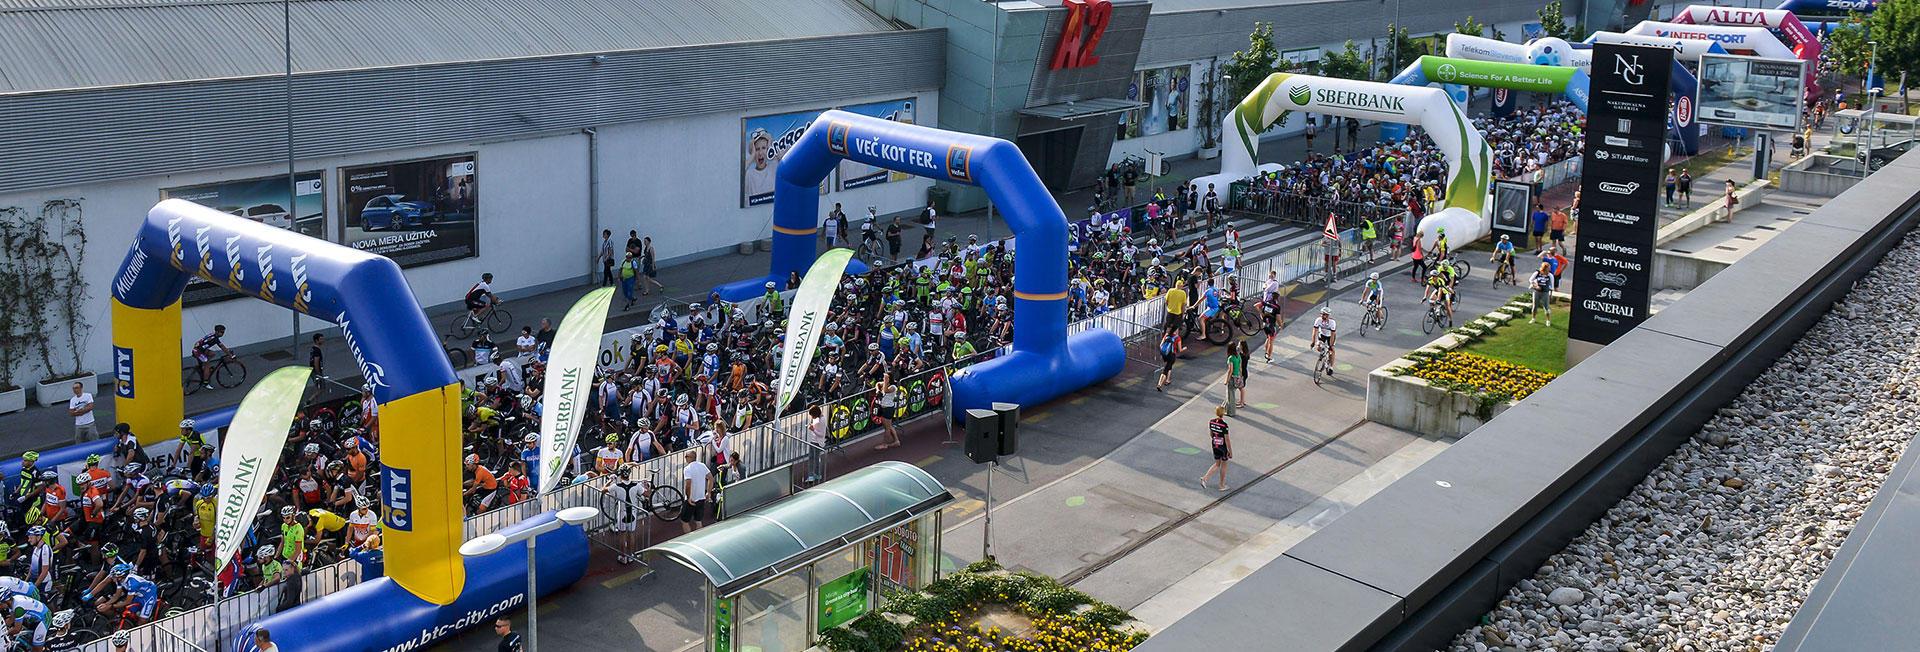 Maratona Franja BTC City 2017 9 - 11. 6 2017